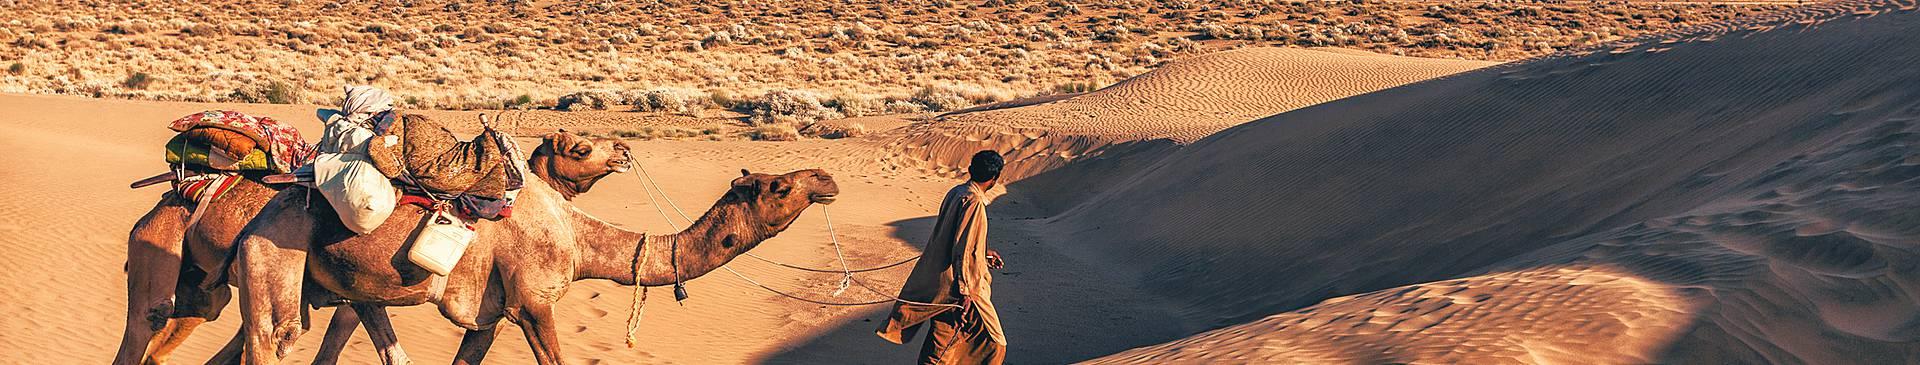 Desert tours in India